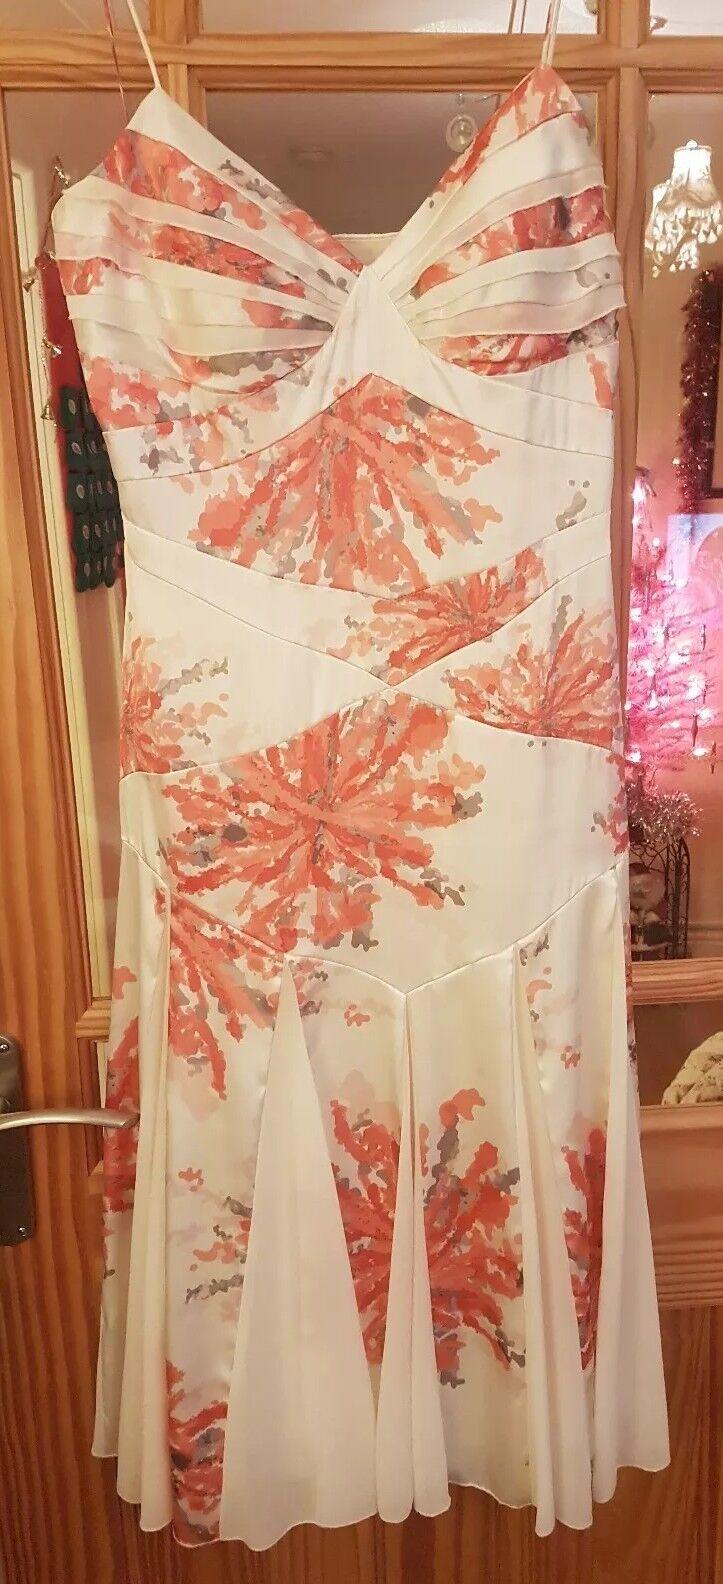 BNWT New Tags Ladies Amanda Wakeley Designer Satin Voile Occasion Dress